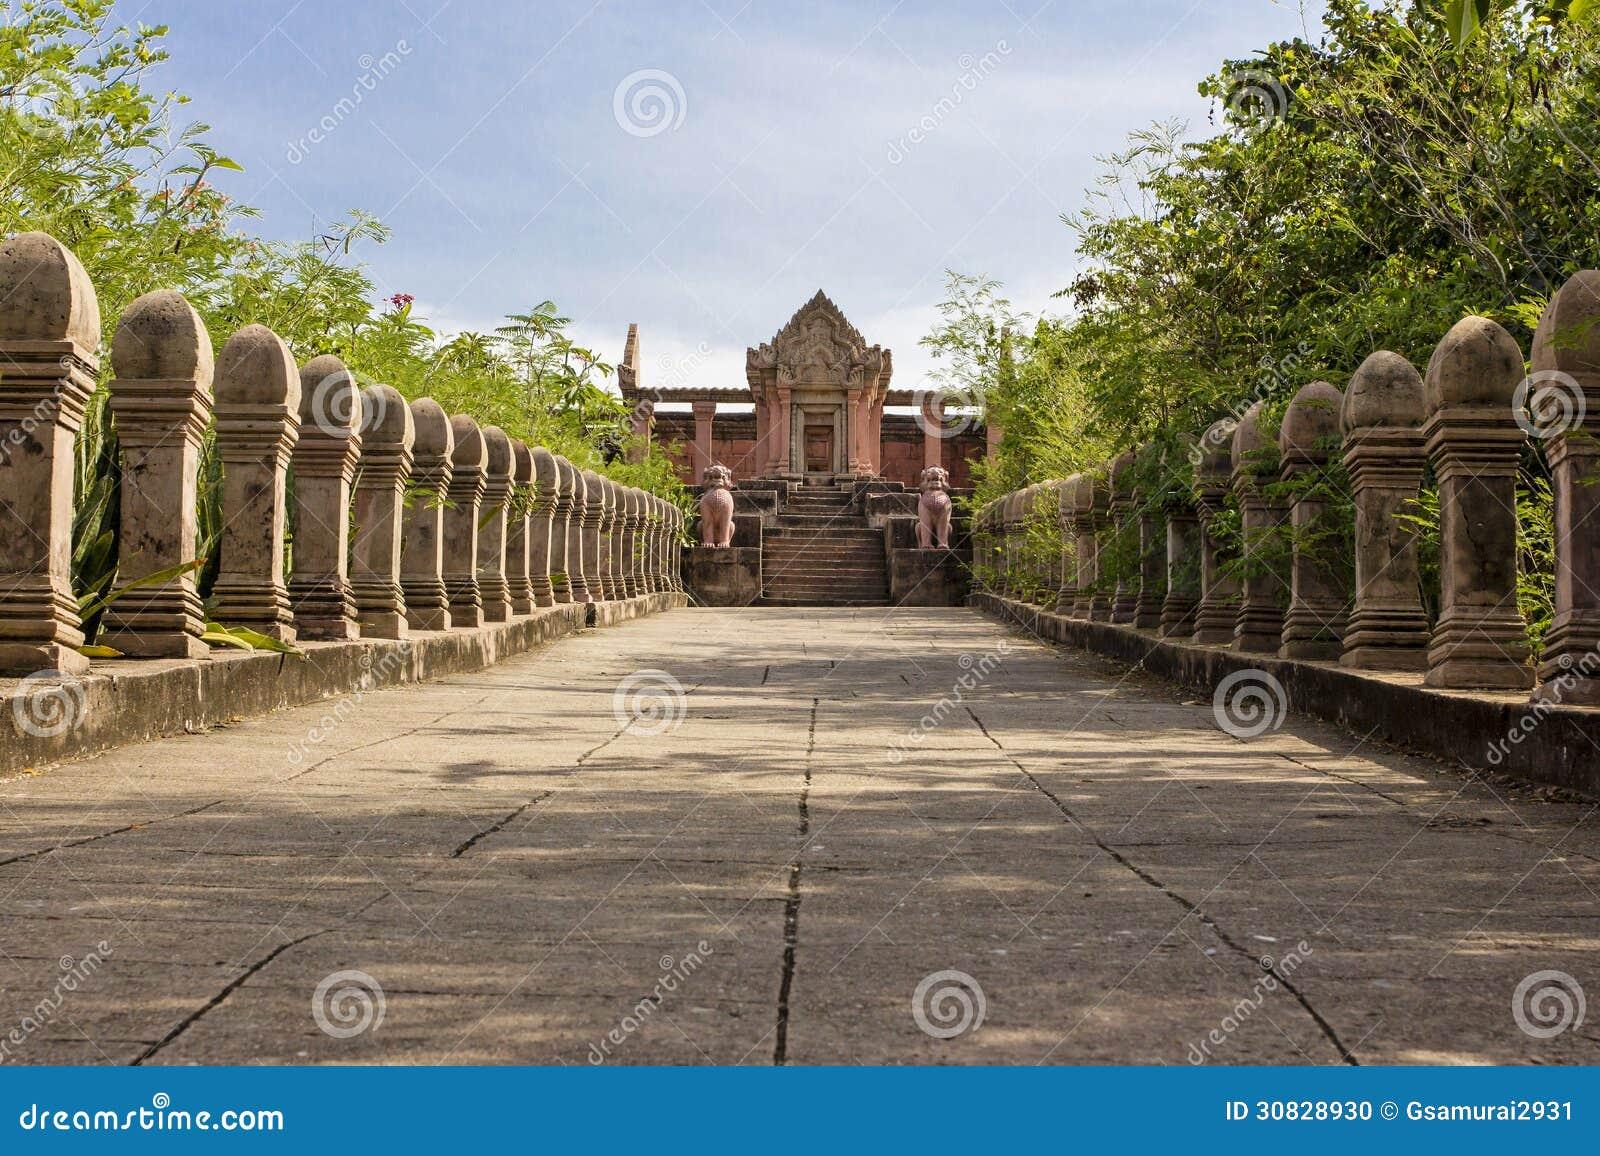 Riproduzione Prasat Phra Wihan alla città antica, Sumutprakarn, Th